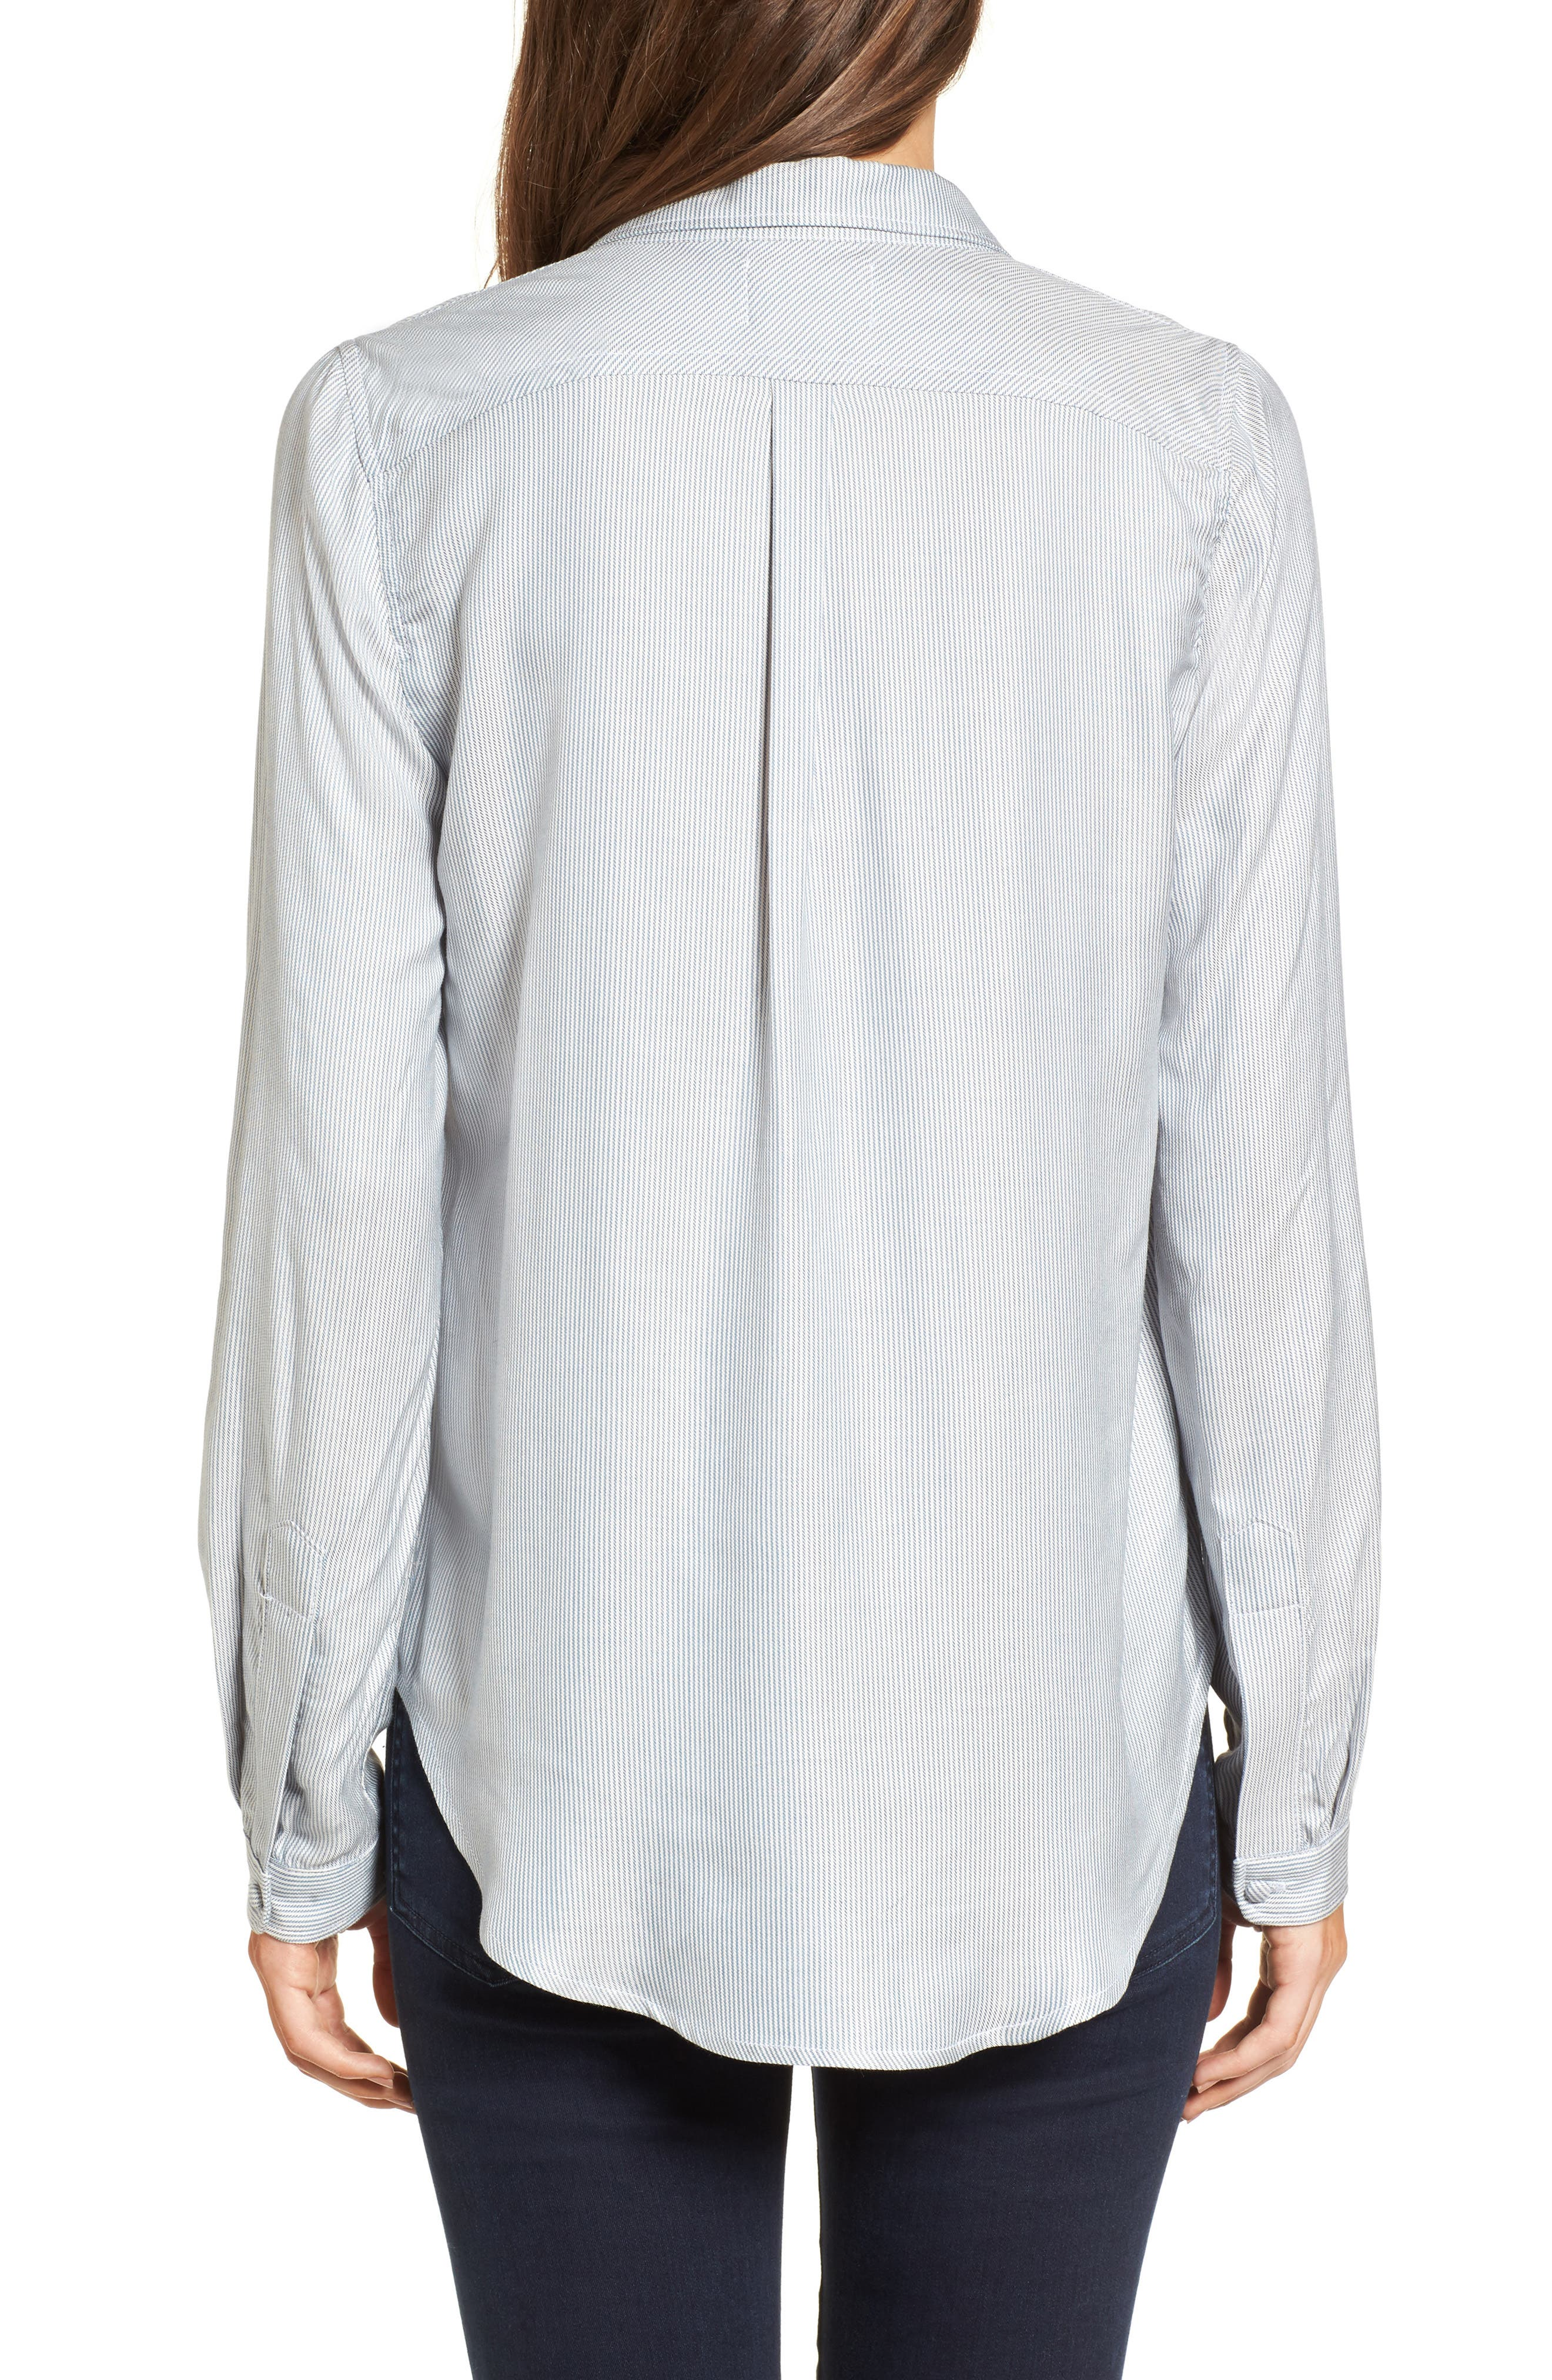 Berea Shirt,                             Alternate thumbnail 2, color,